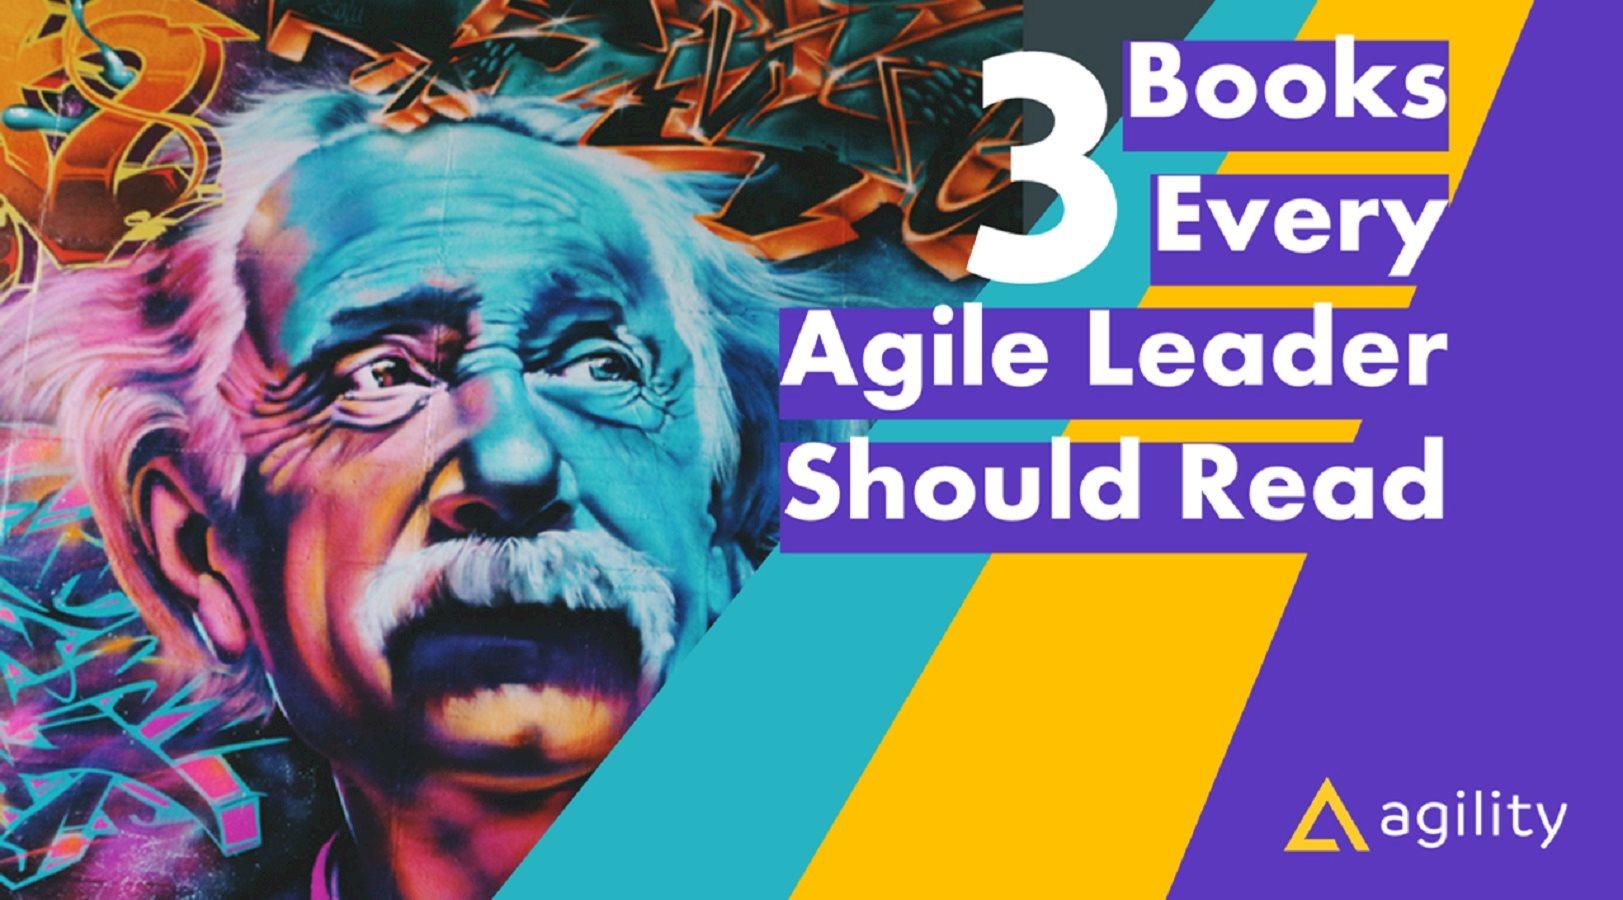 3 Books Every Agile Leader Should Read